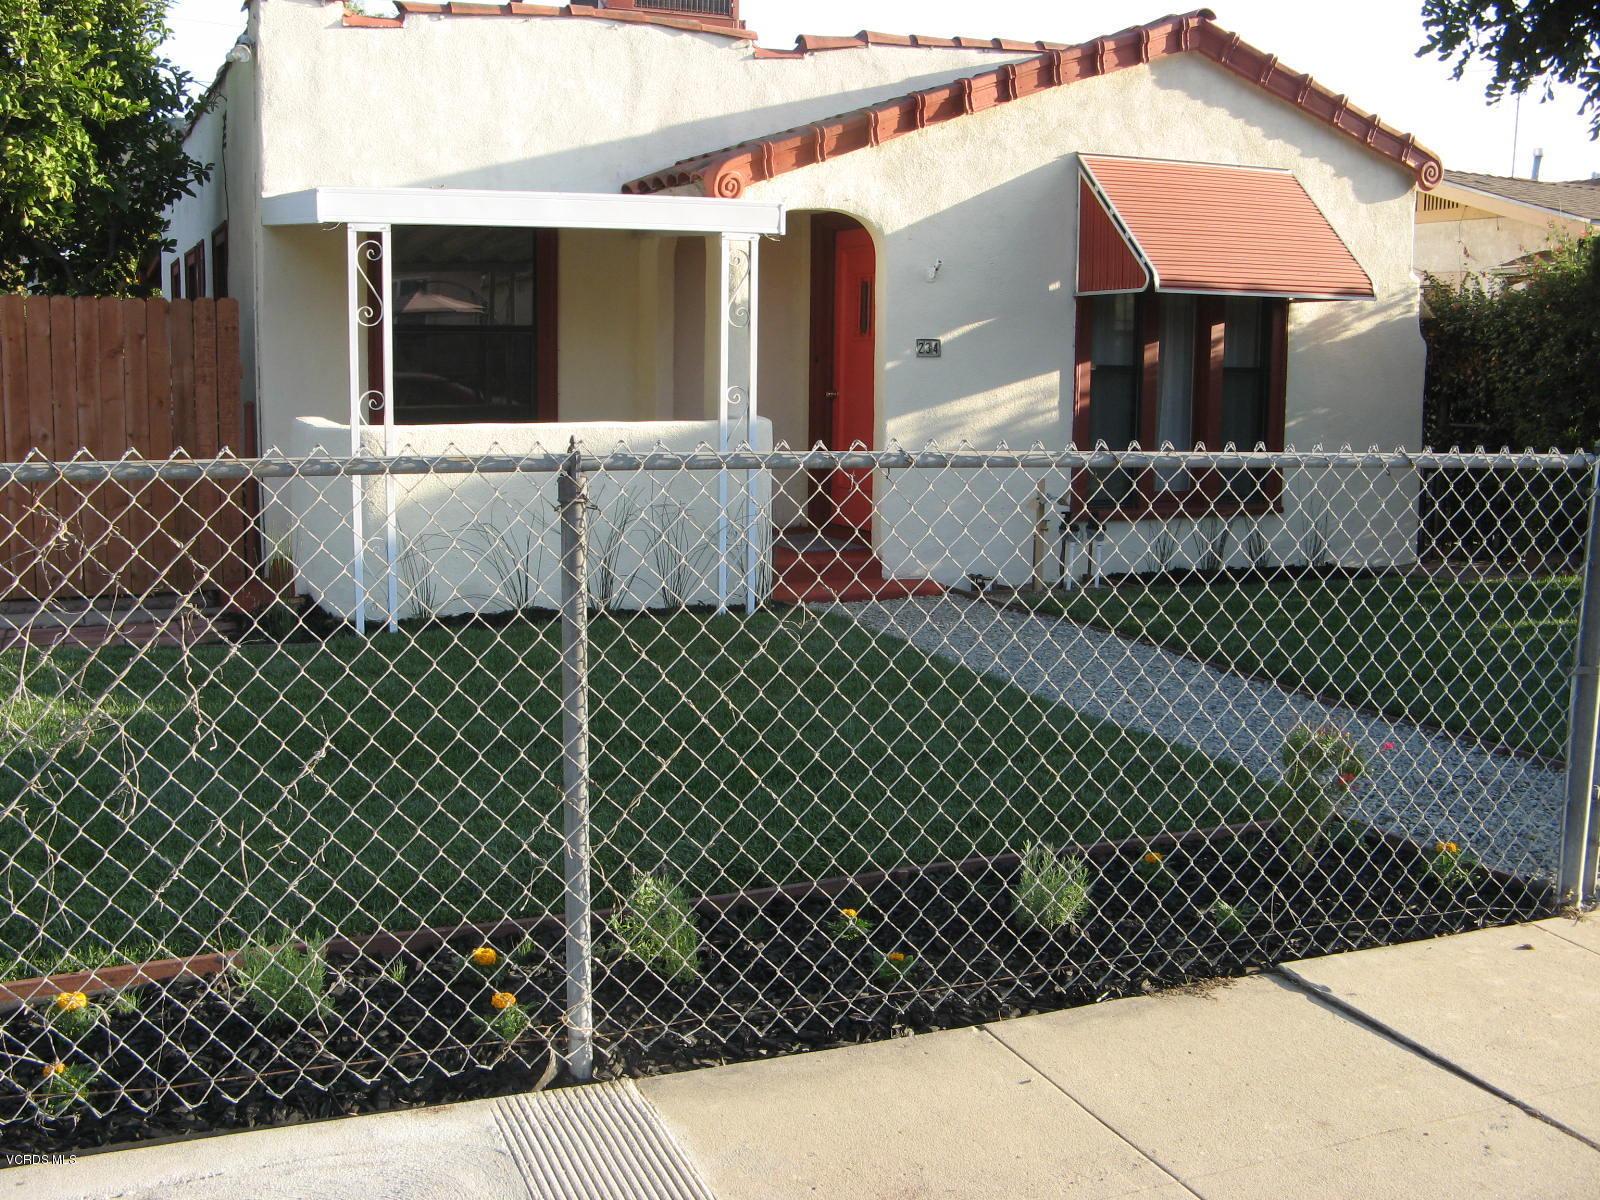 234 Chestnut Avenue, Los Angeles, CA 90042